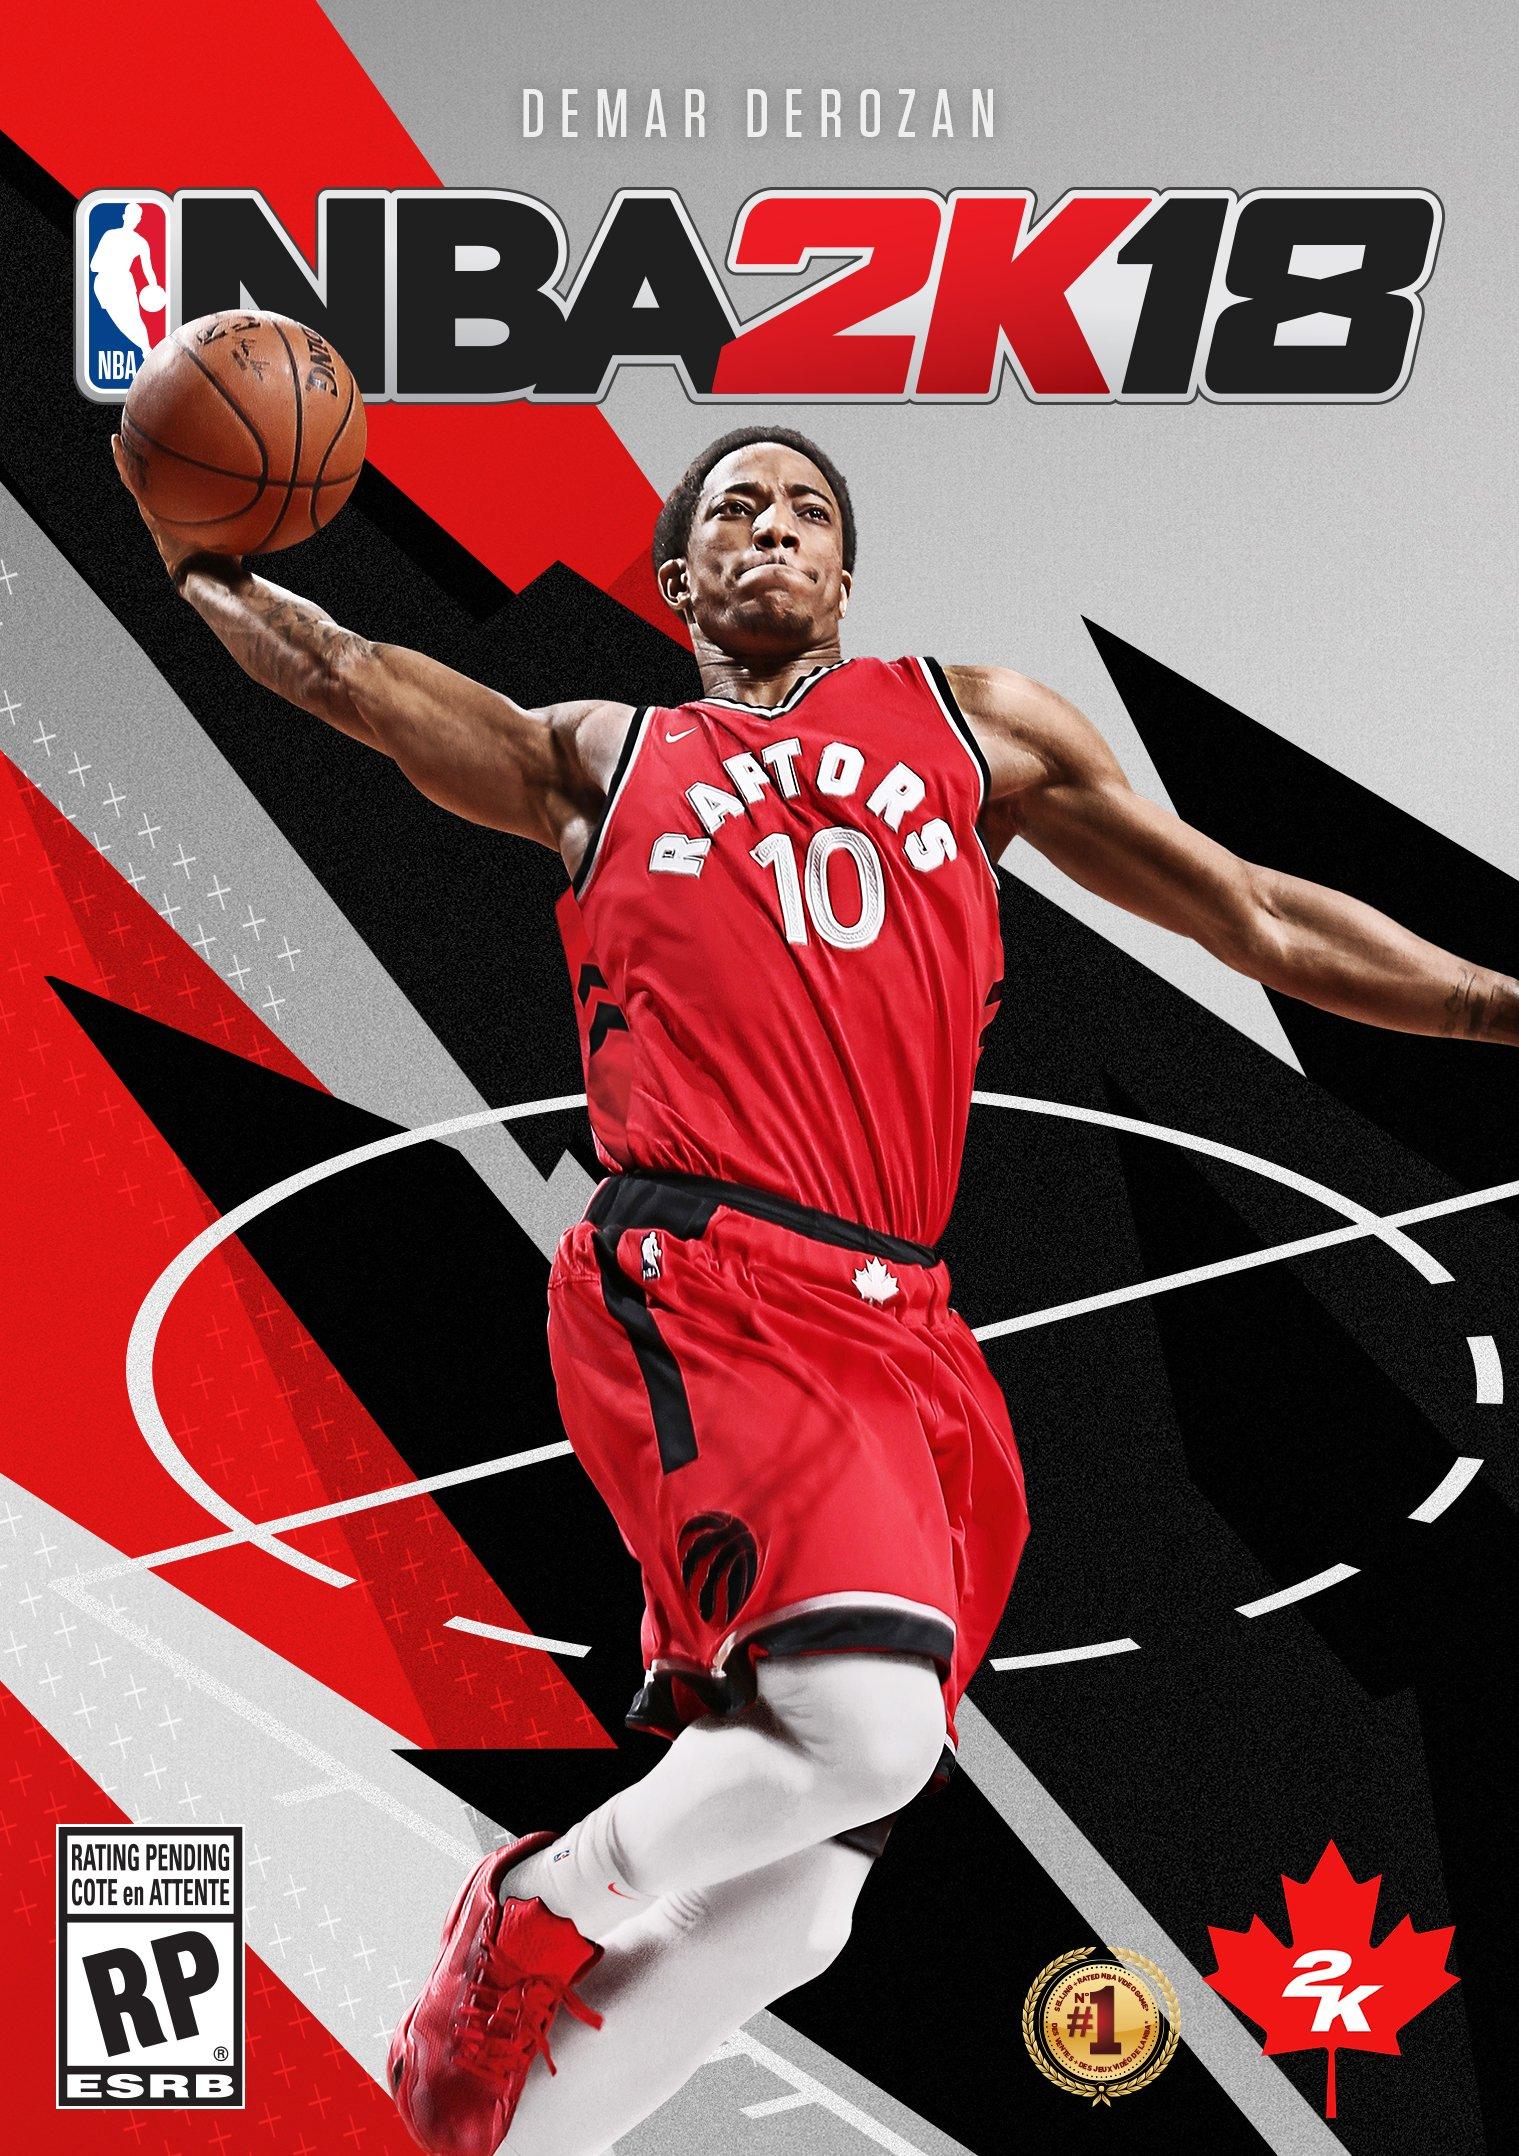 Toronto Raptor Gets Nba 2K18 Cover